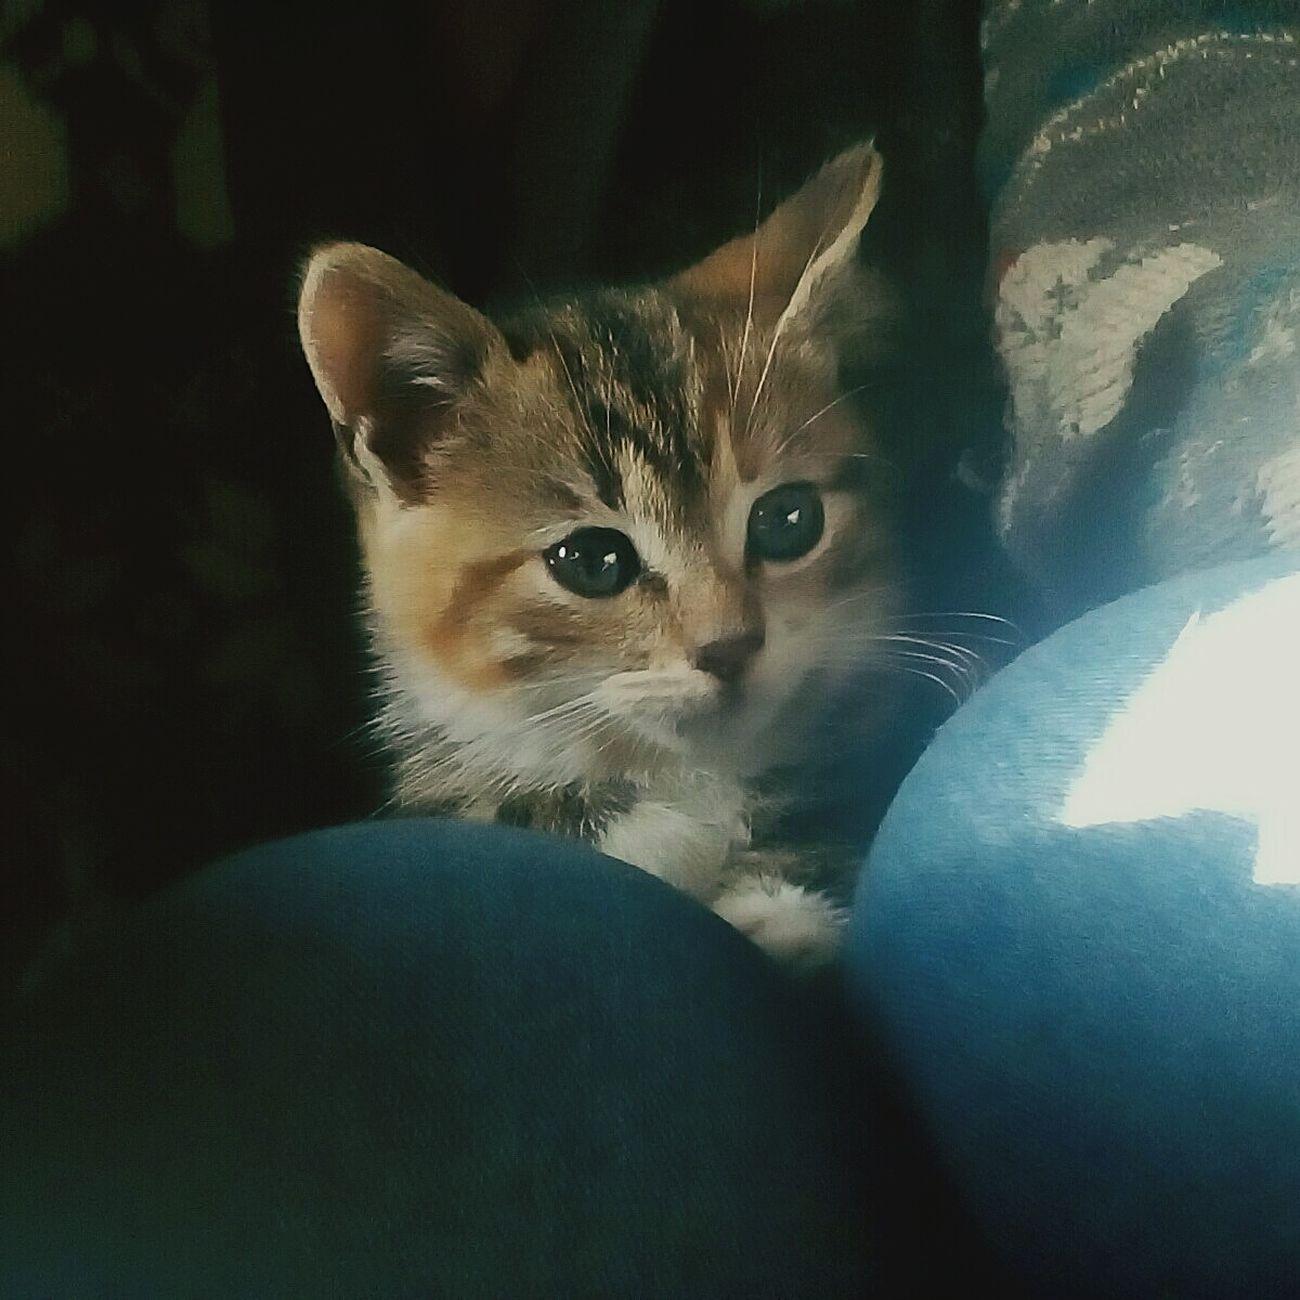 Cat♡ Green Eyes Nora Miauuu 😺 MyLove❤